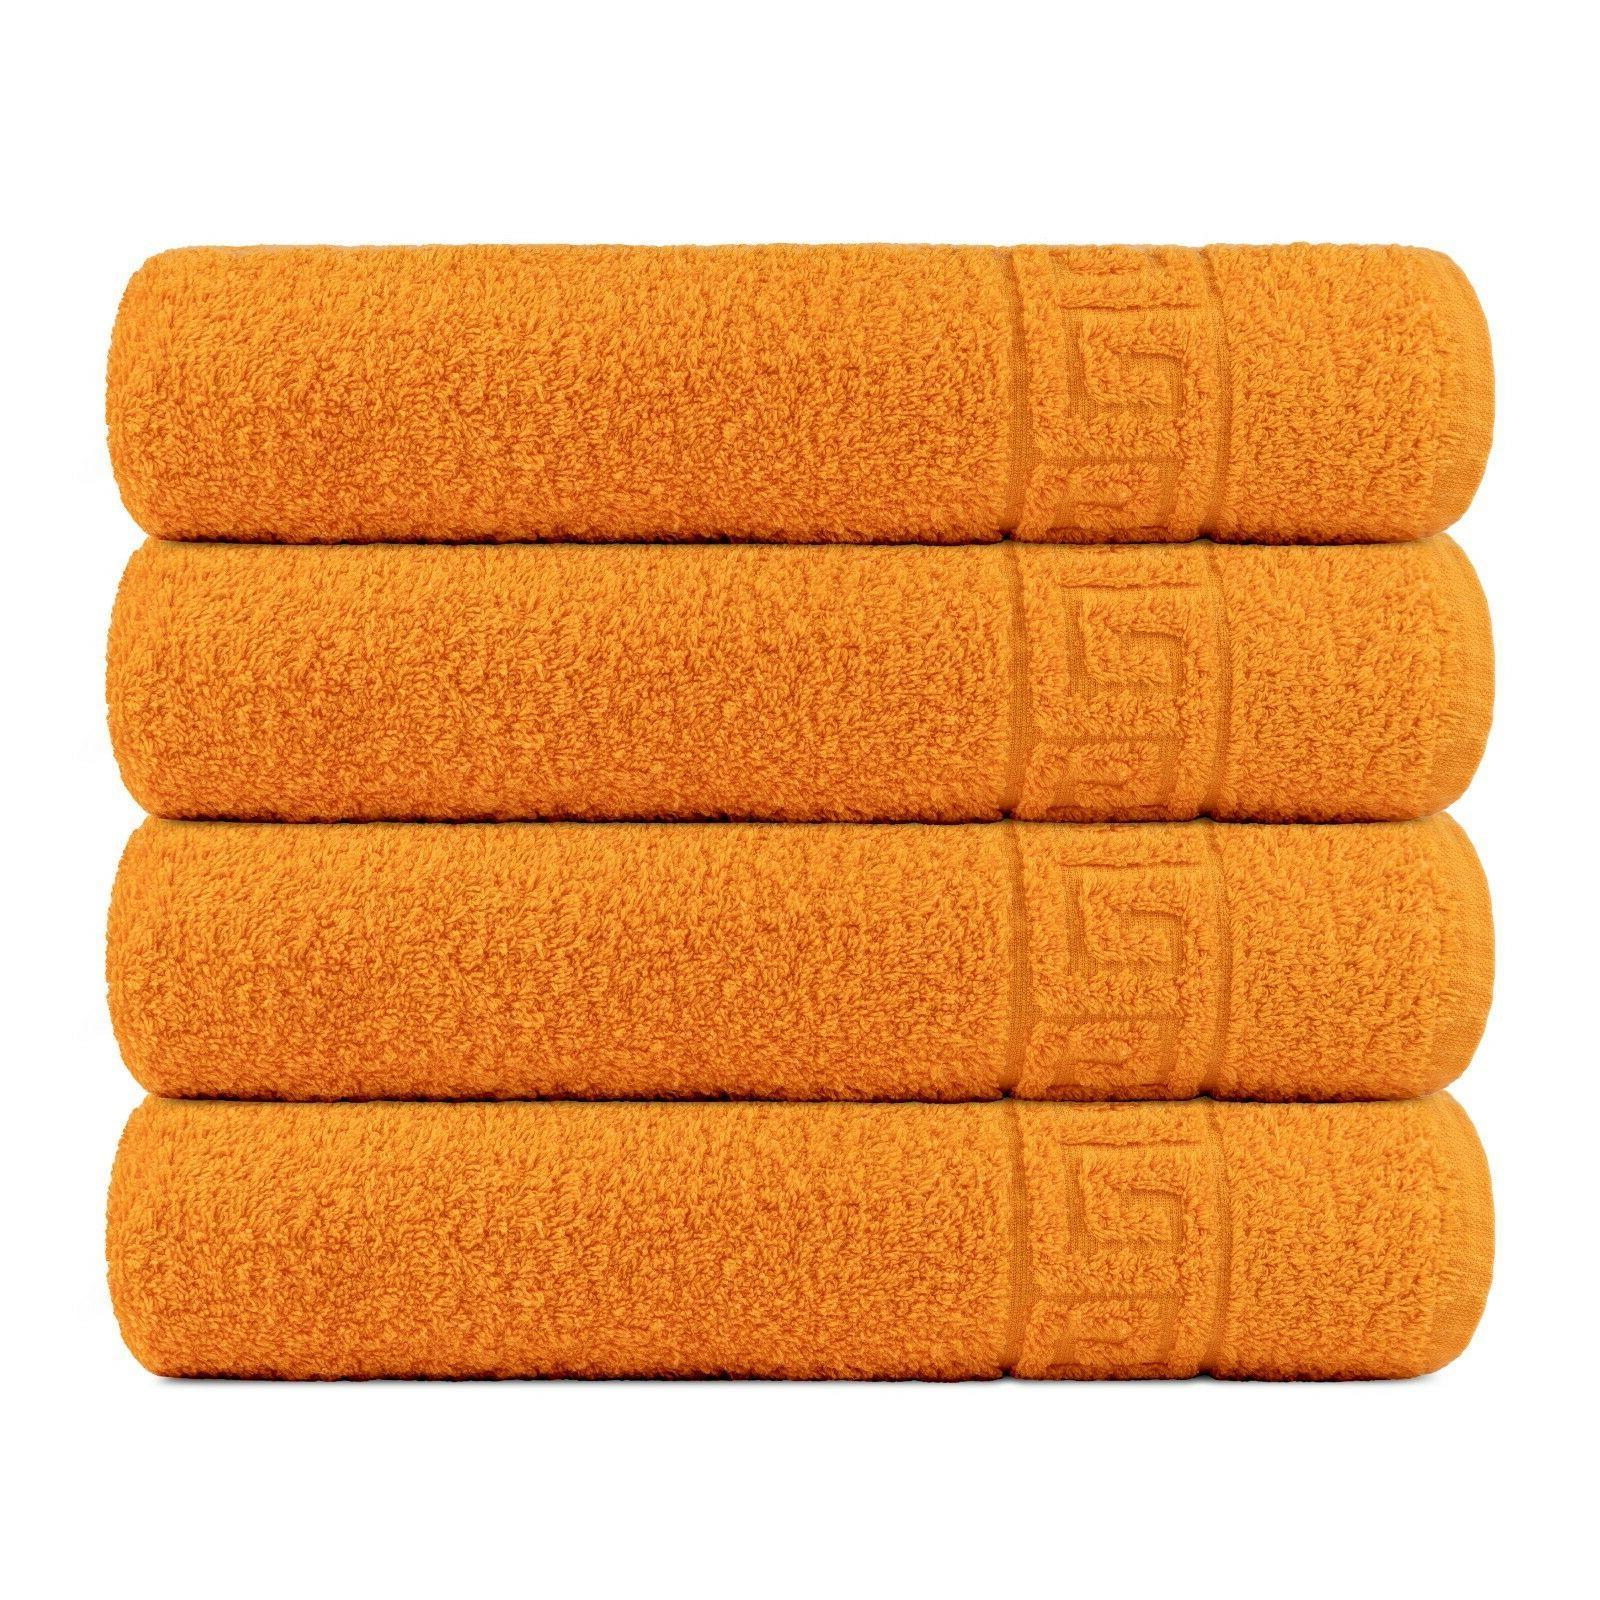 bath towel cotton set 4 pcs towels